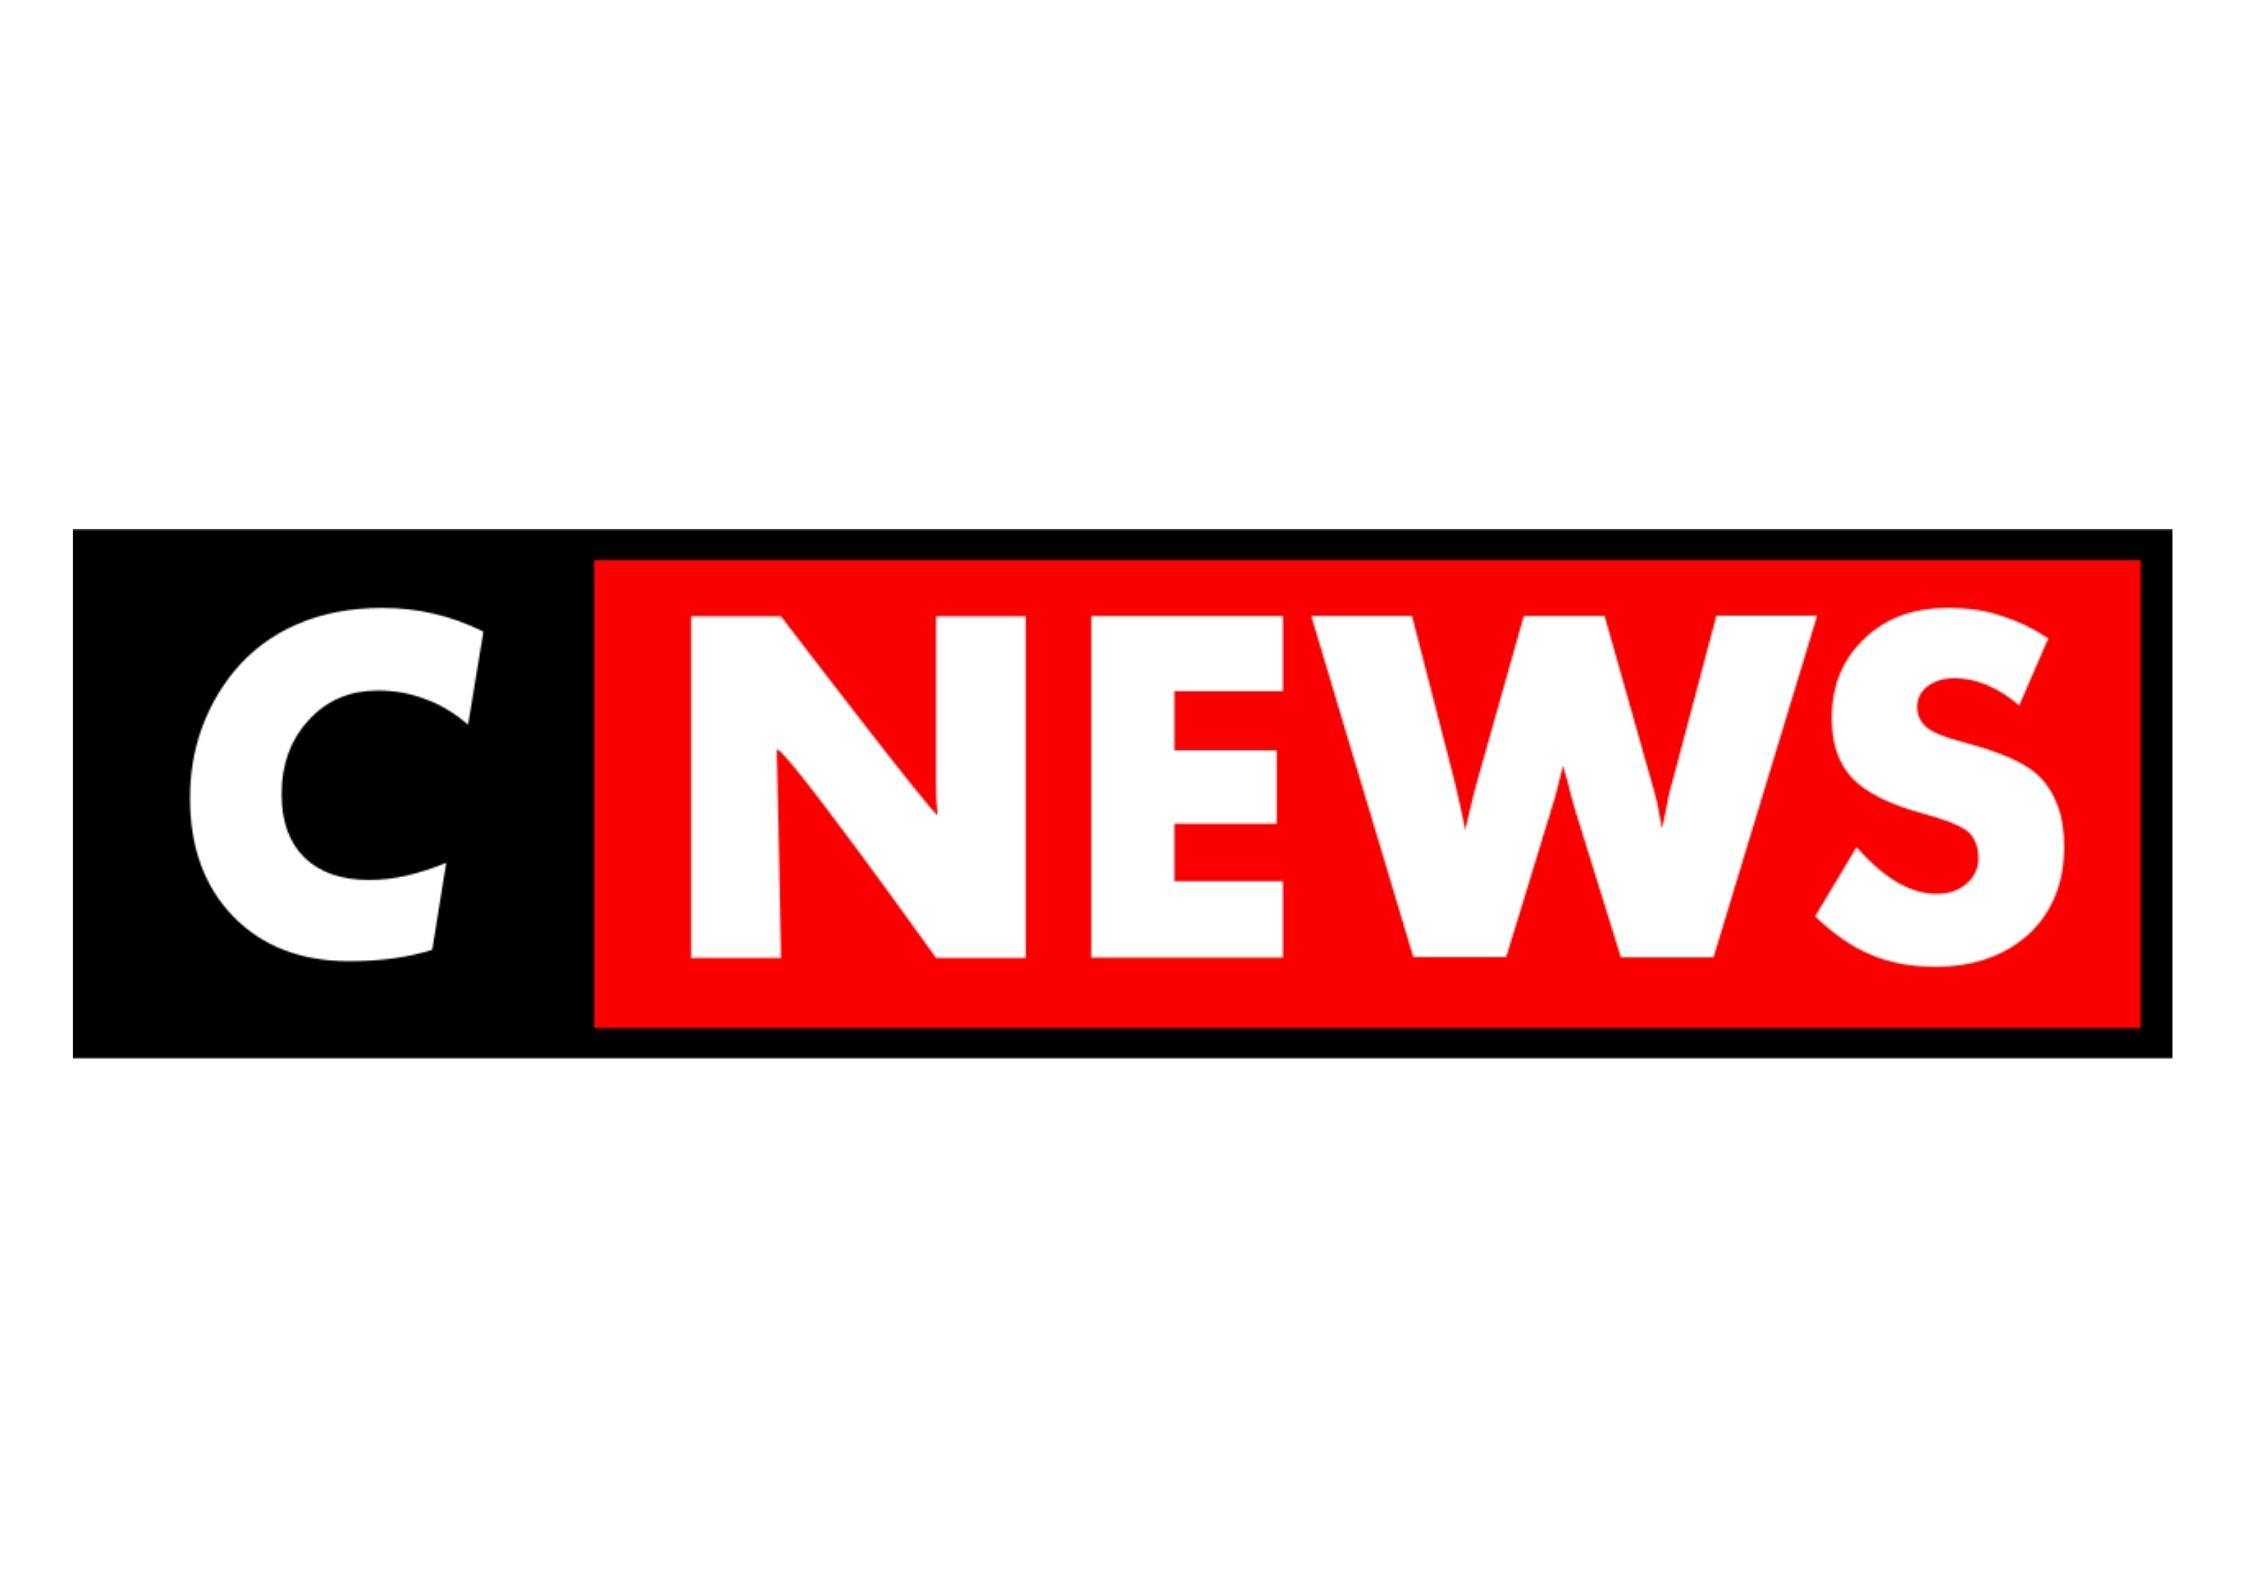 logo c news